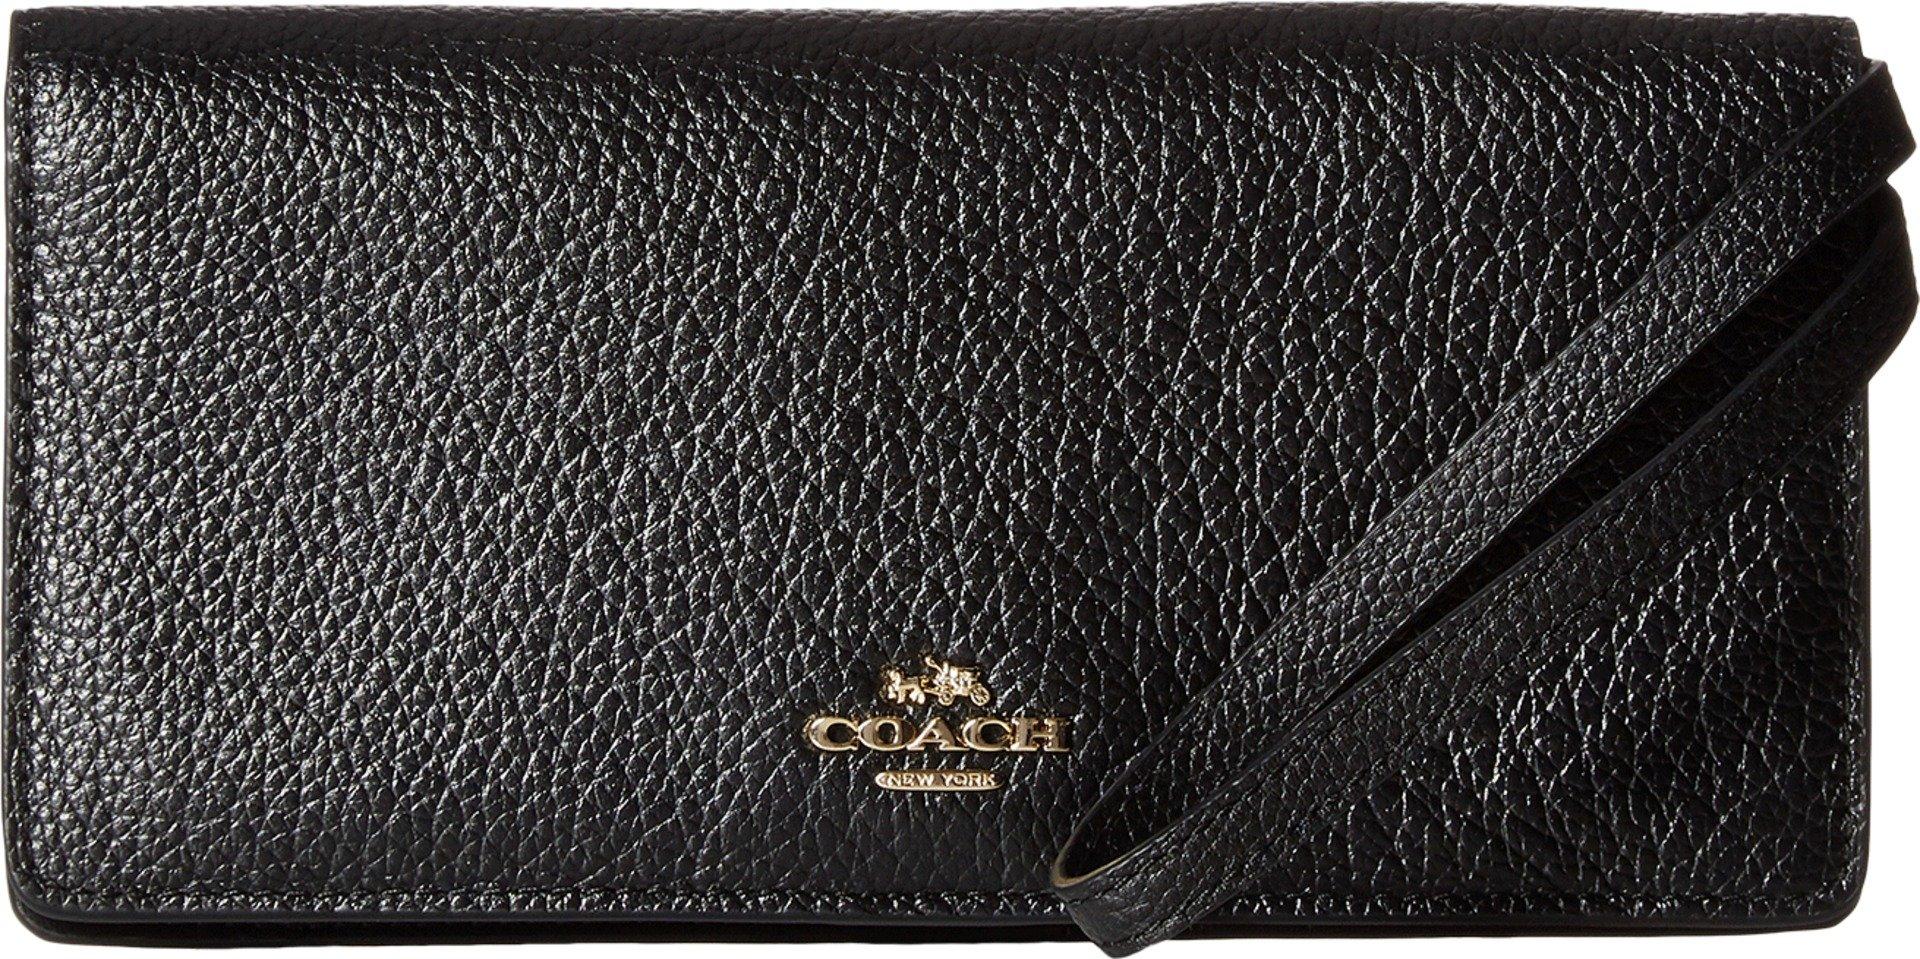 COACH Women's Pebbled Leather Slim Wallet LI/Black